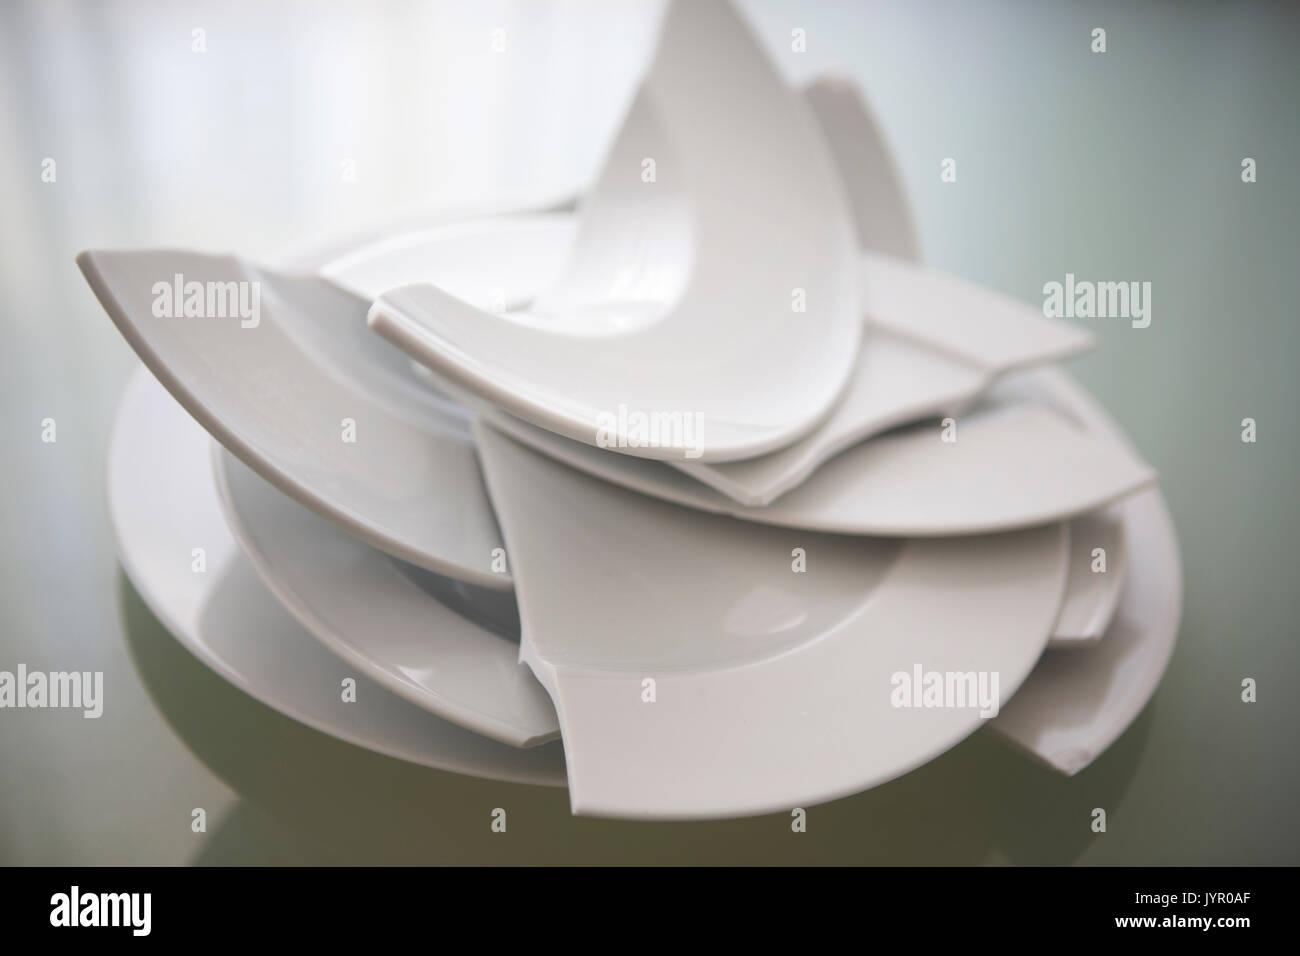 Plate smashing stock photos plate smashing stock images - Pile plate 3v ...